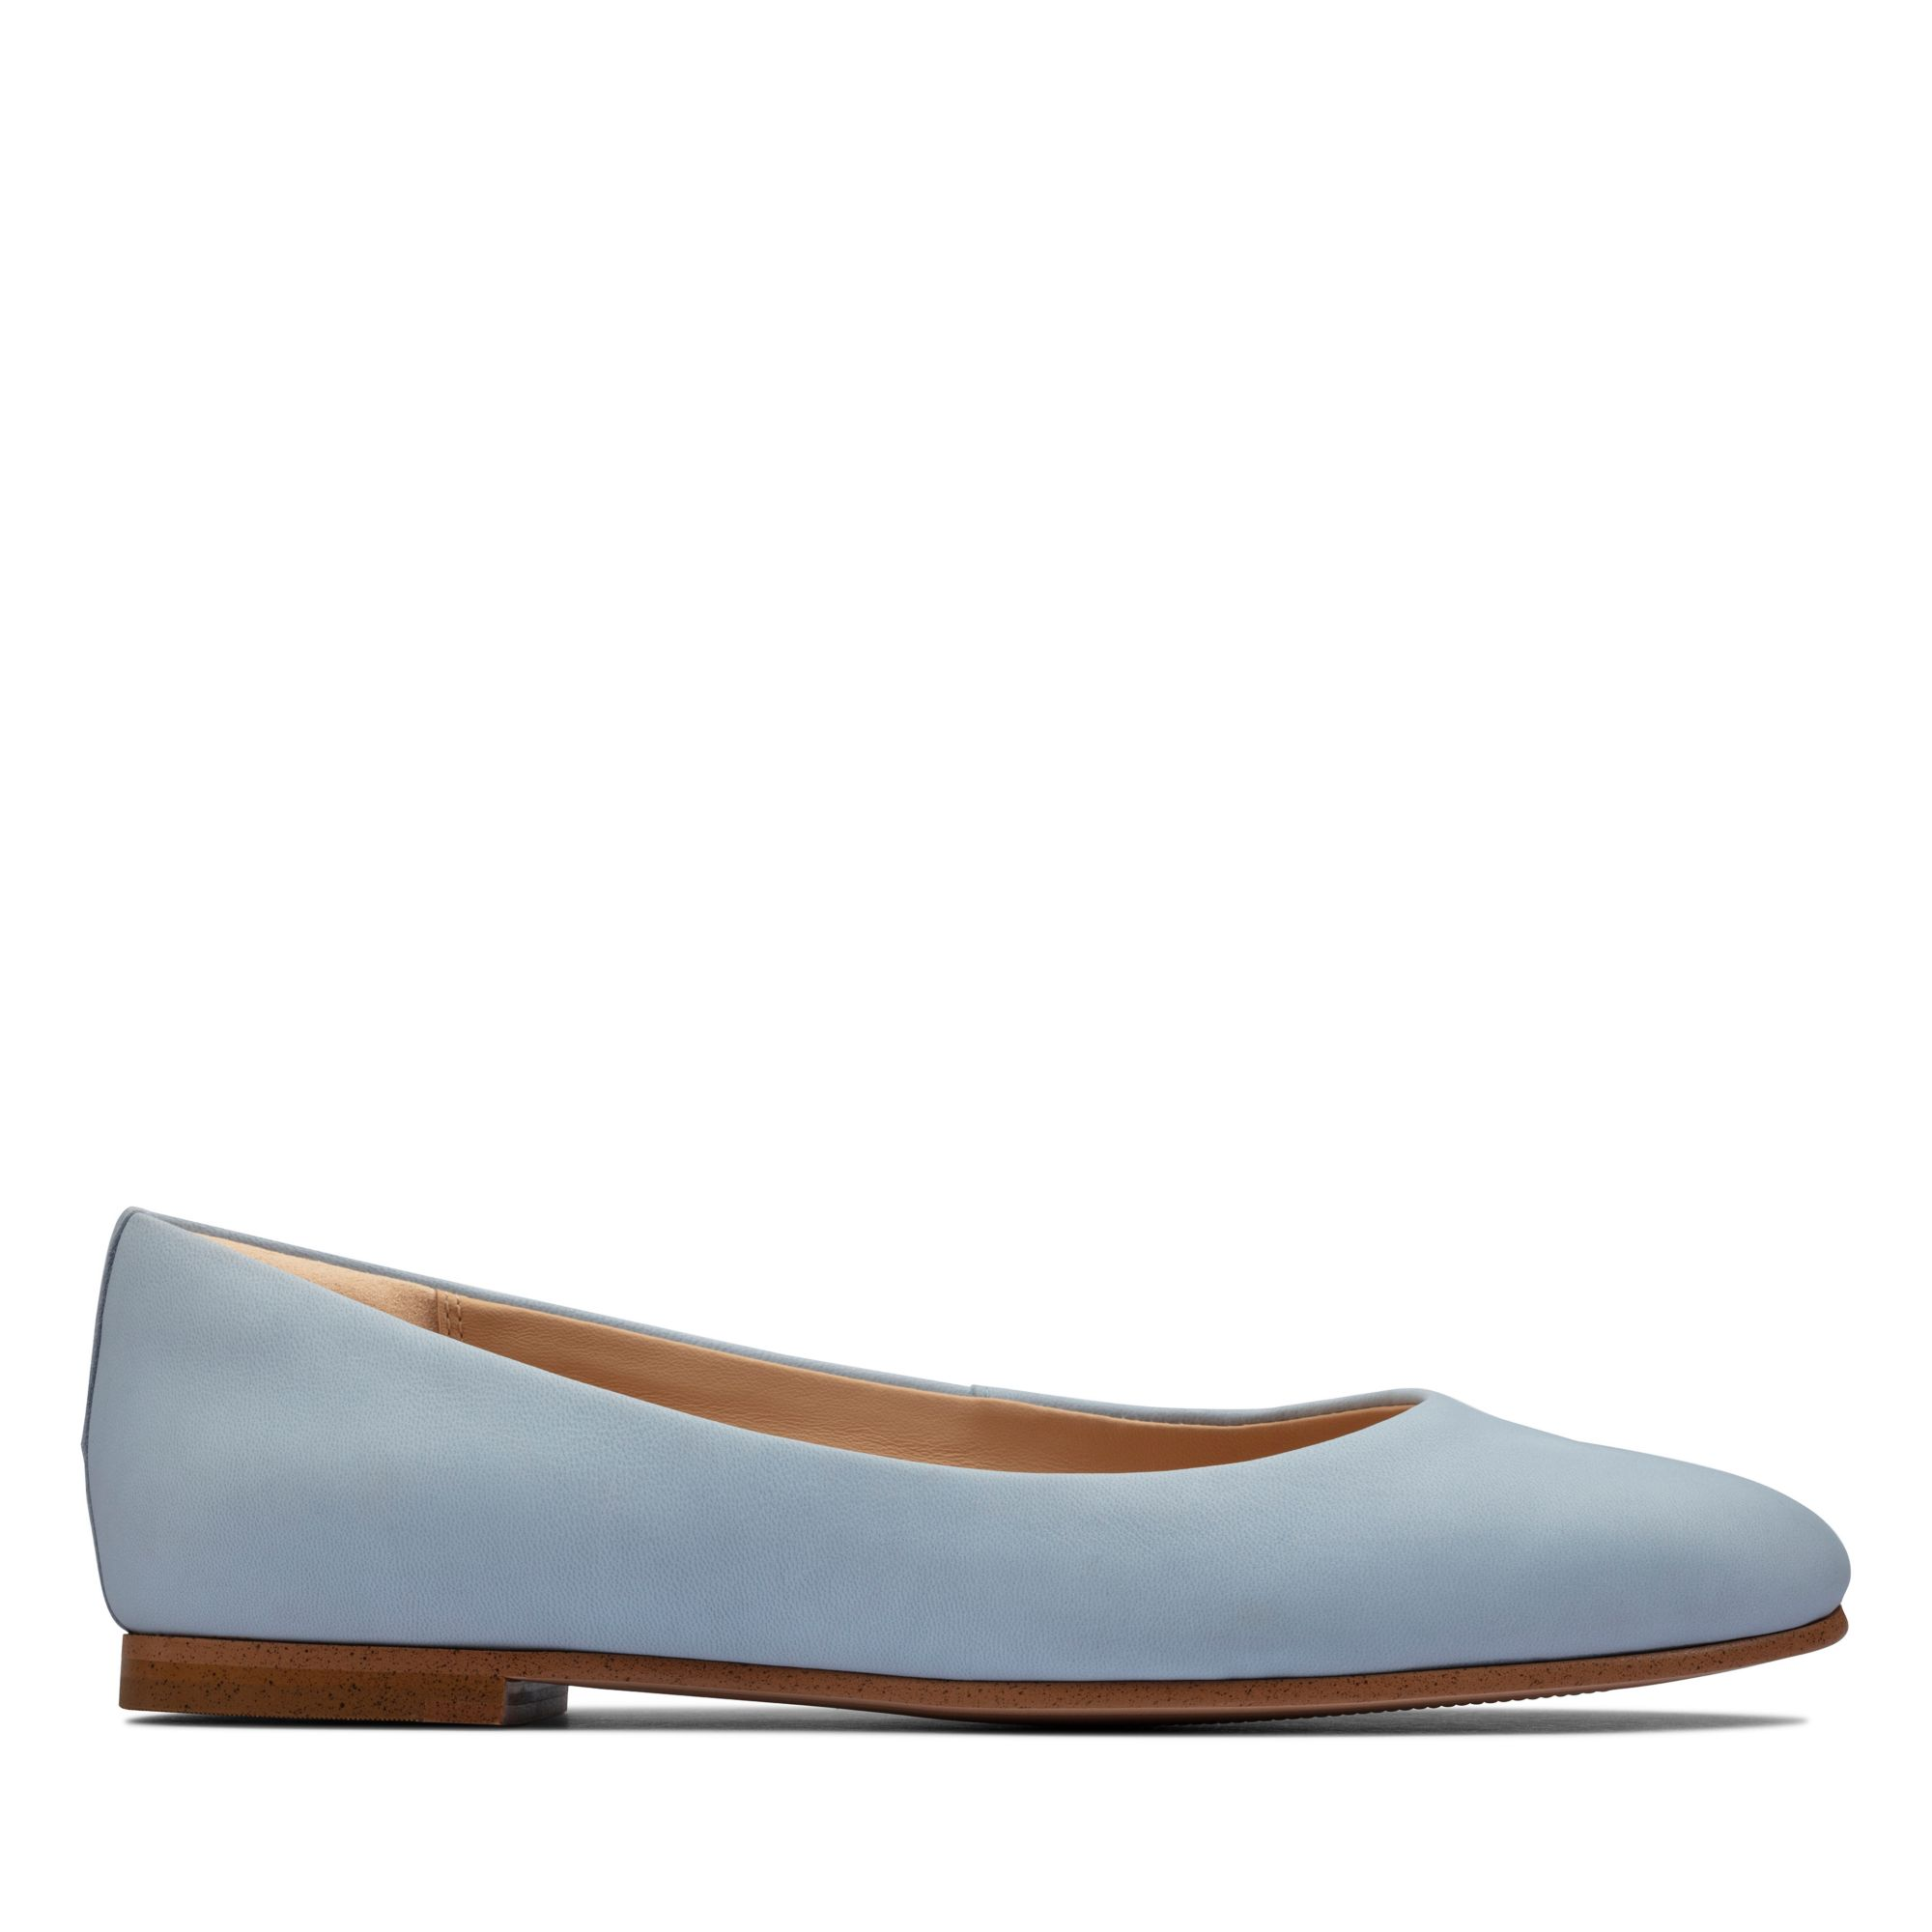 Clarks純甄至柔-Grace Piper芭蕾平底鞋(淡藍色)